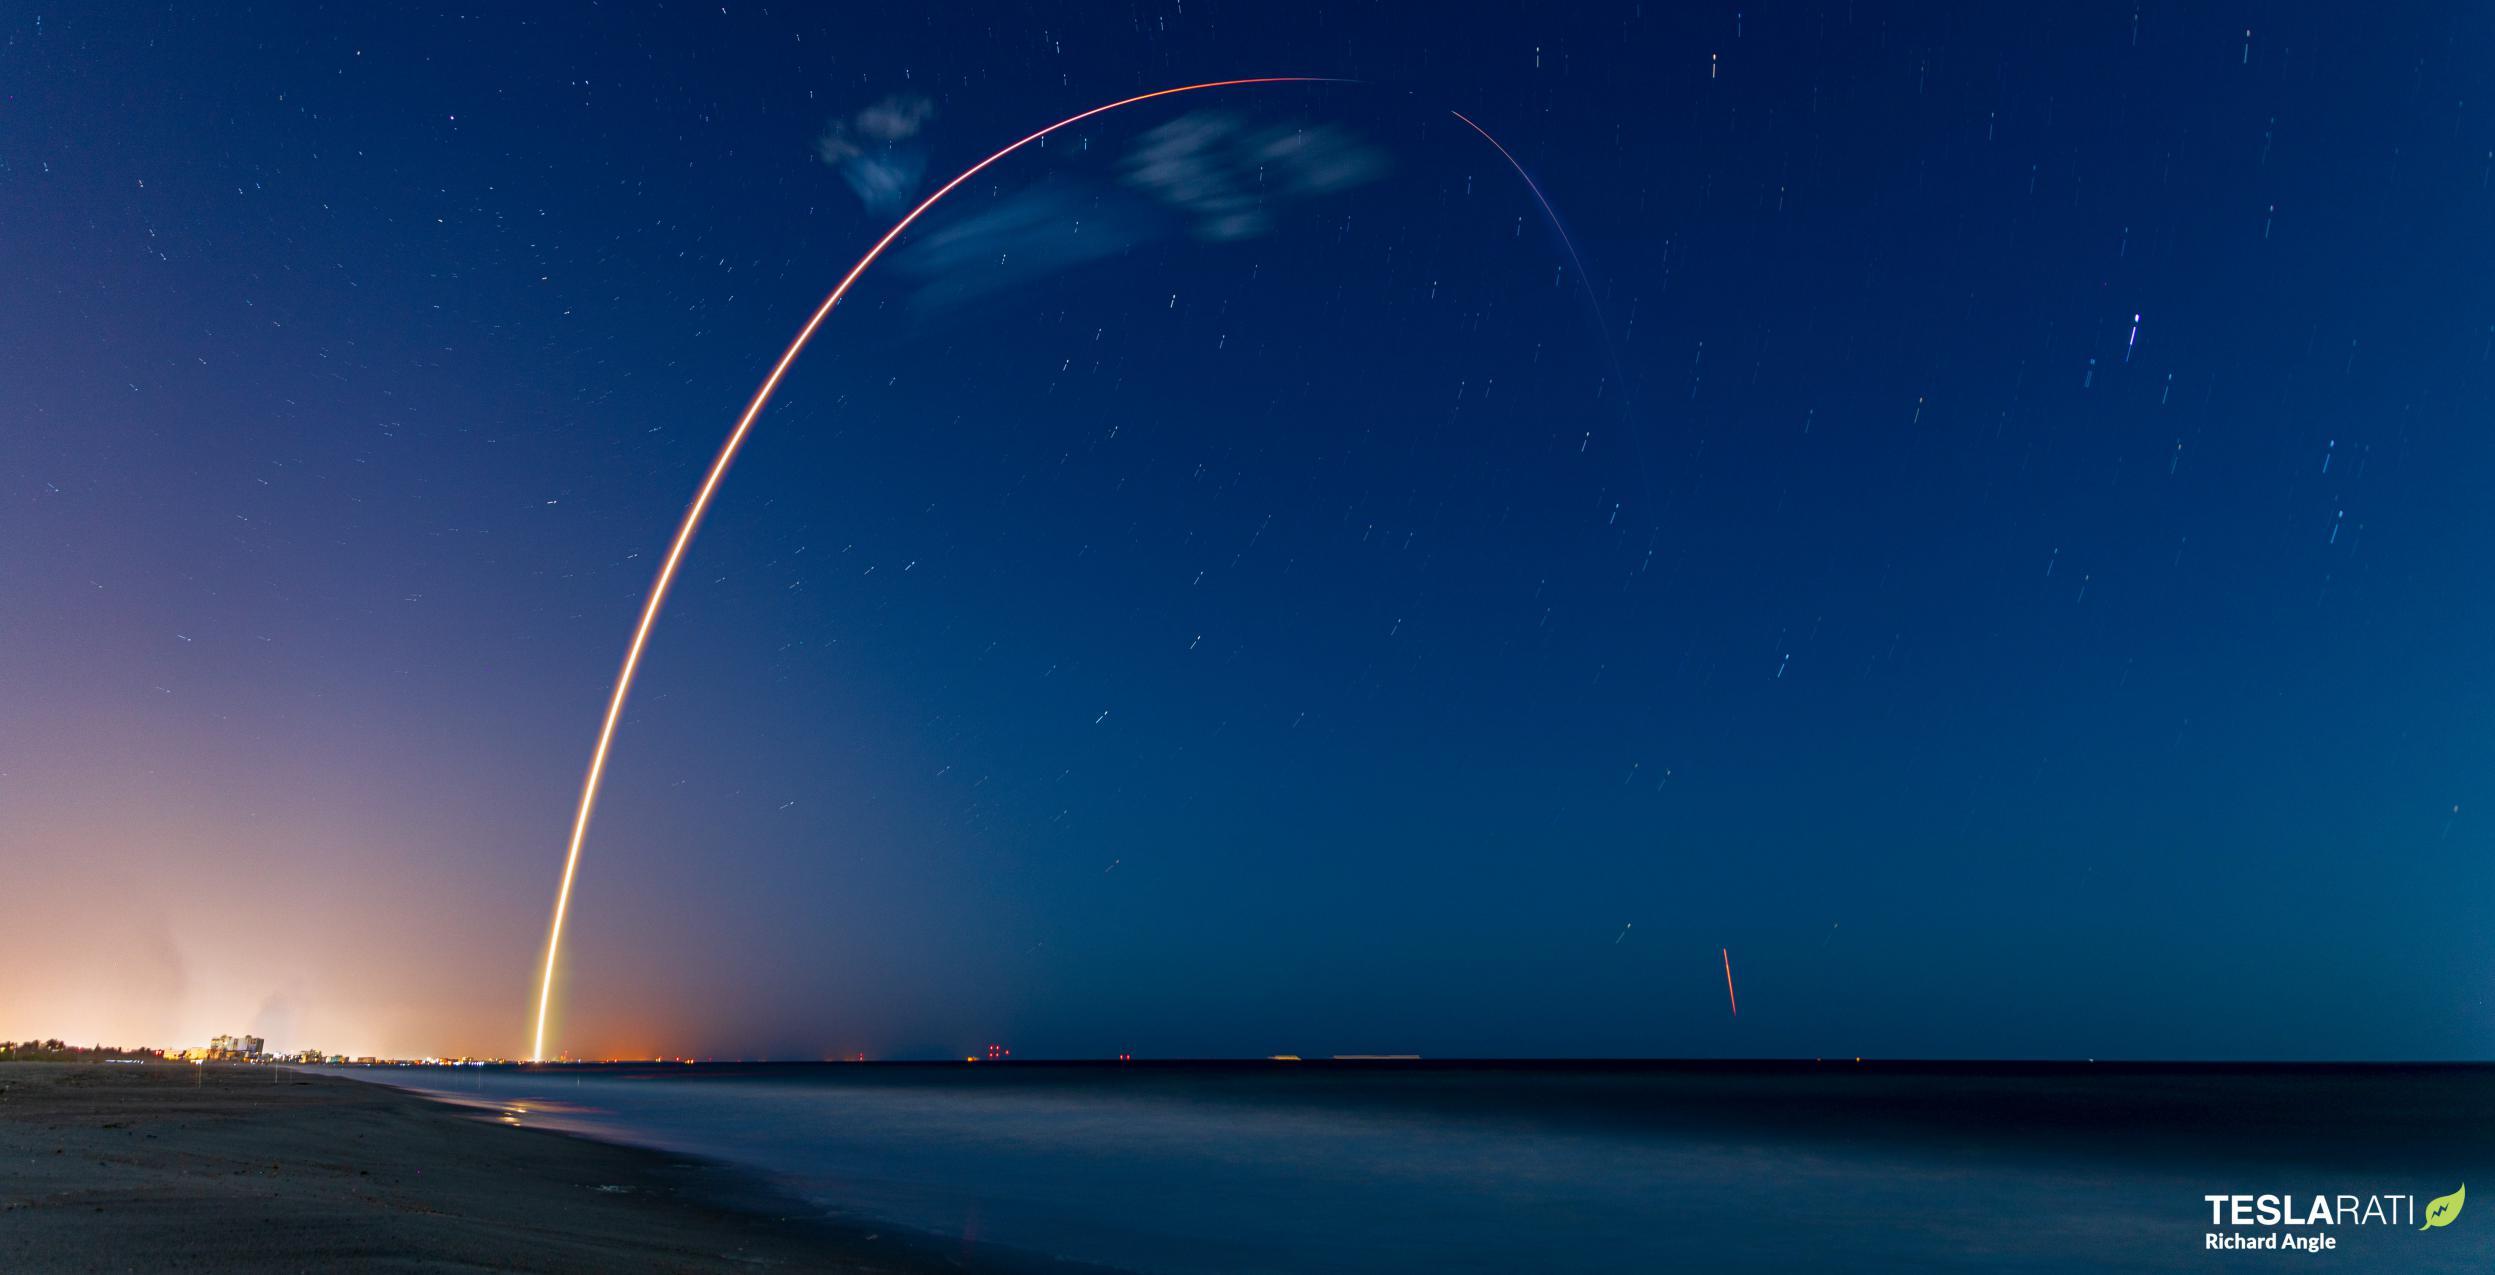 Starlink-24 Falcon 9 B1060 LC-40 042821 (Richard Angle) streak 1 crop (c)